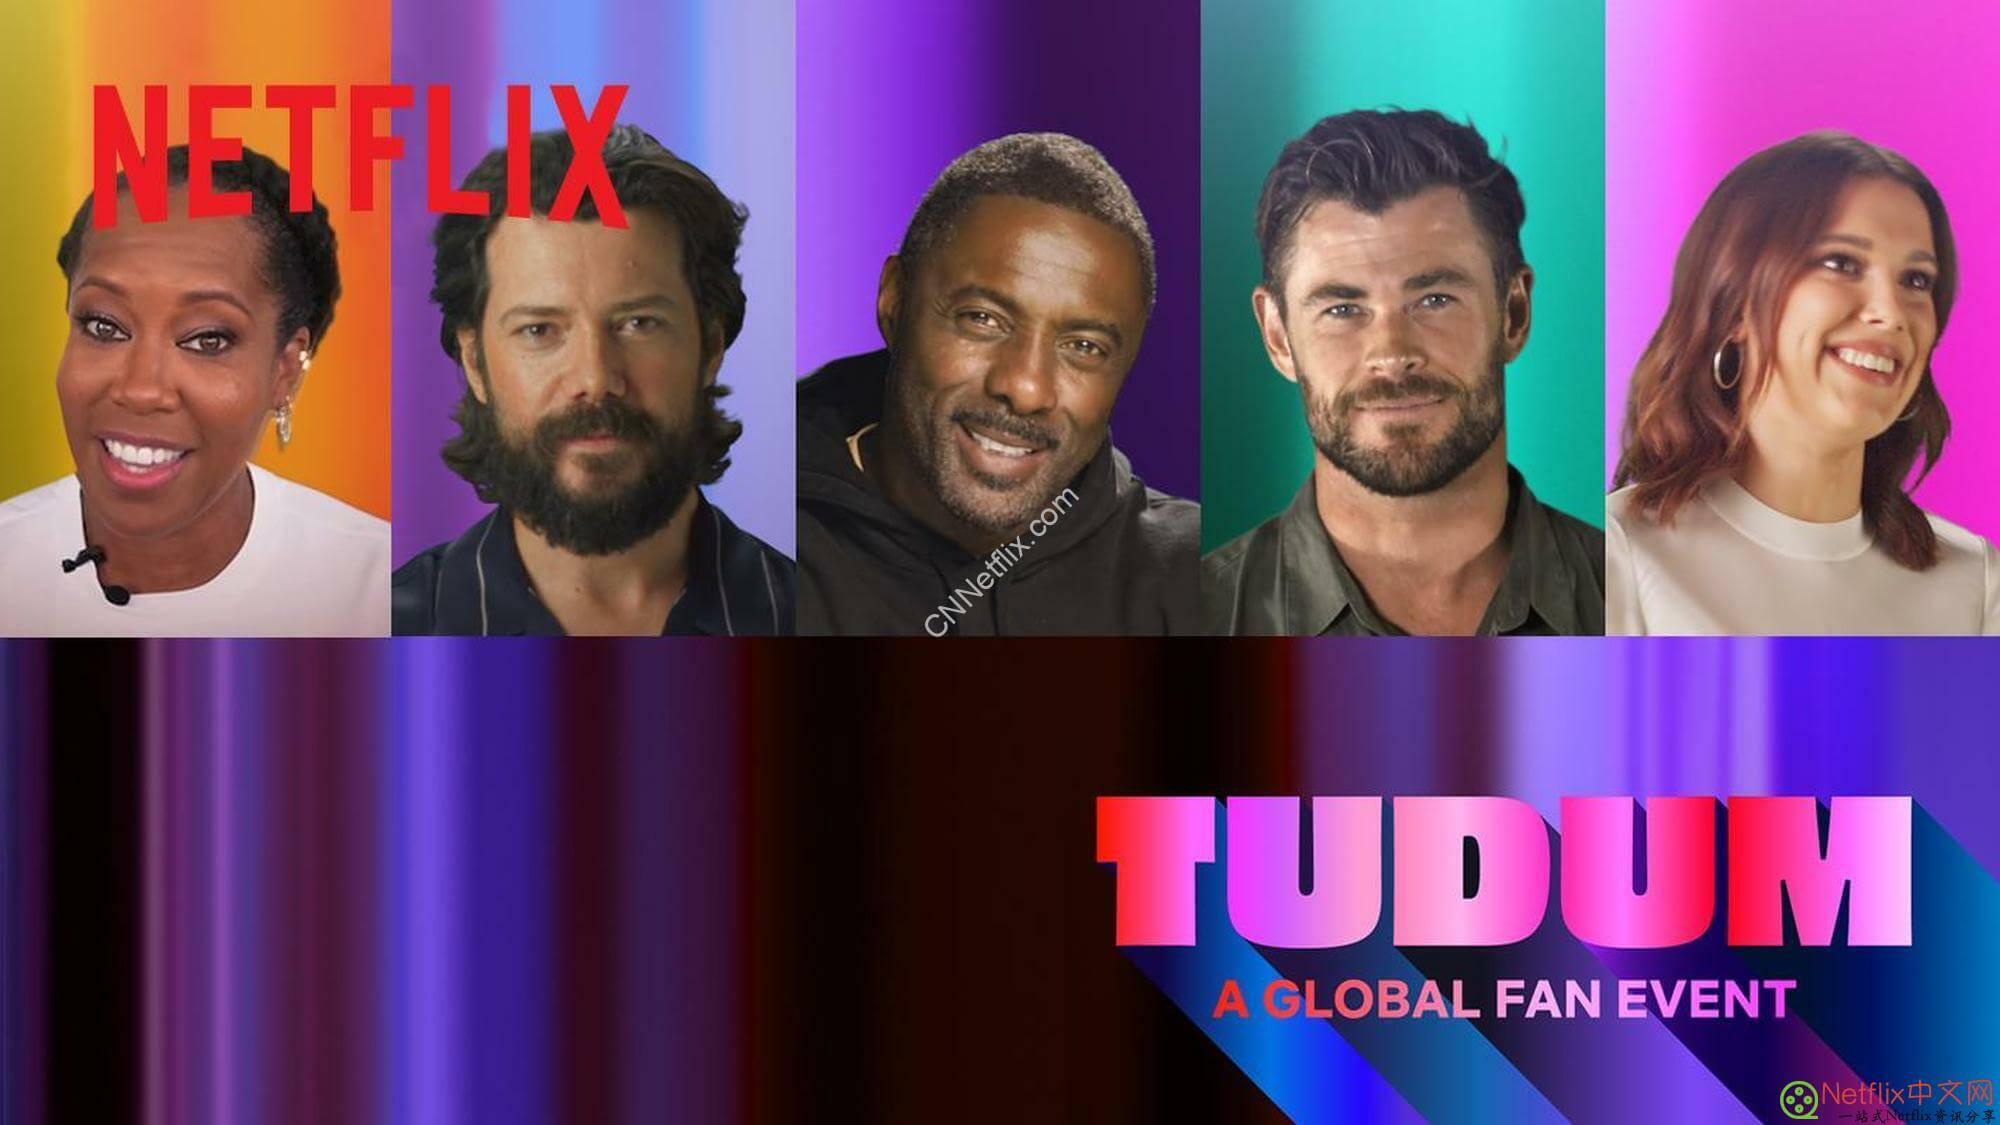 Netflix历史首次TUDUM全球影迷盛会9月25日登场 登登 奈飞 网飞